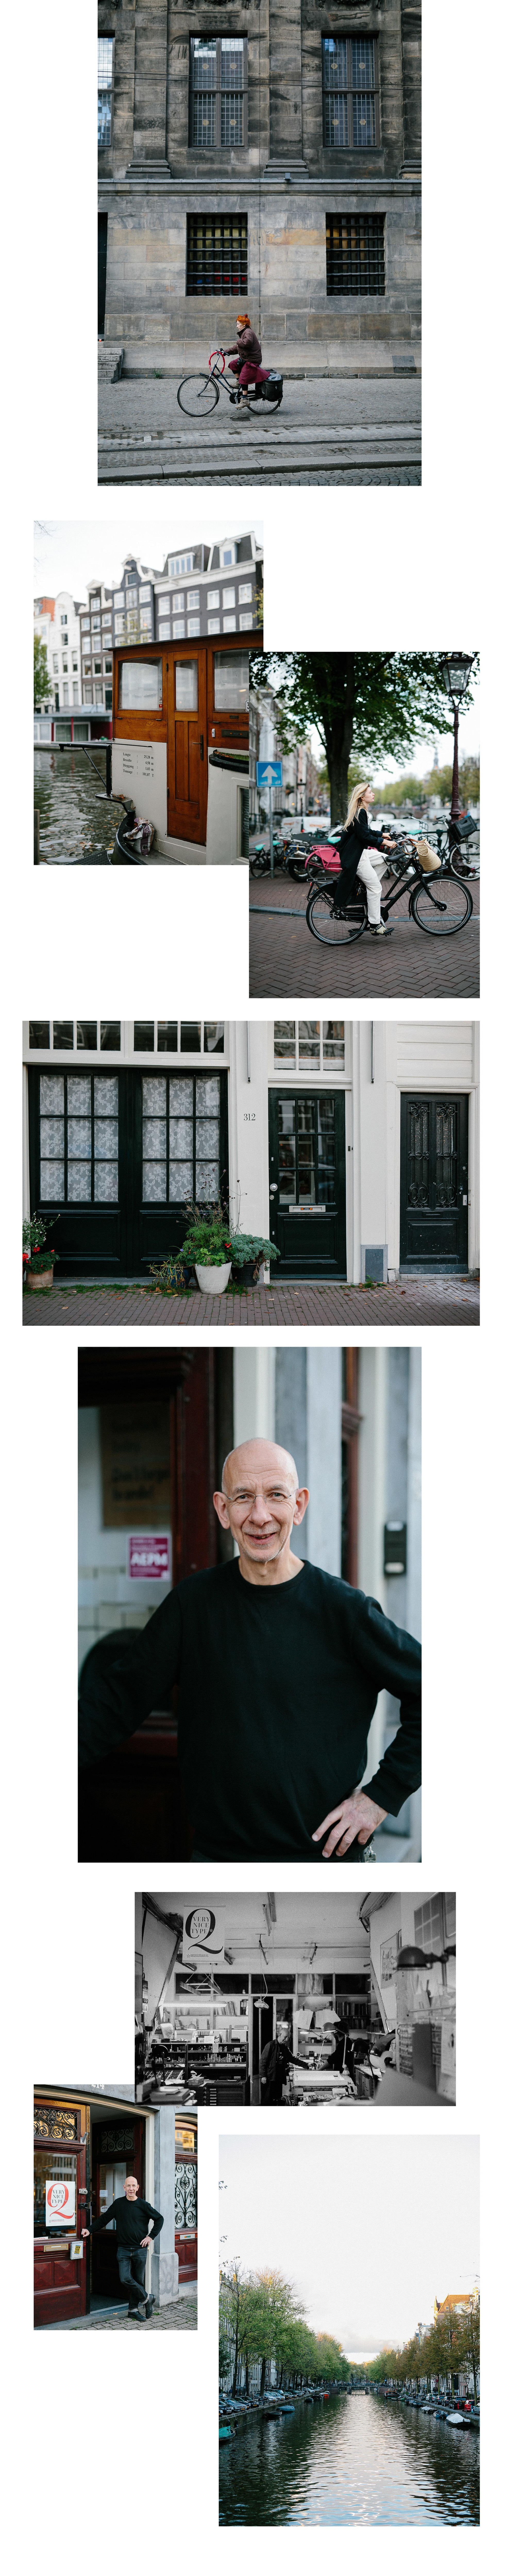 Amsterdam 2 blog.jpg